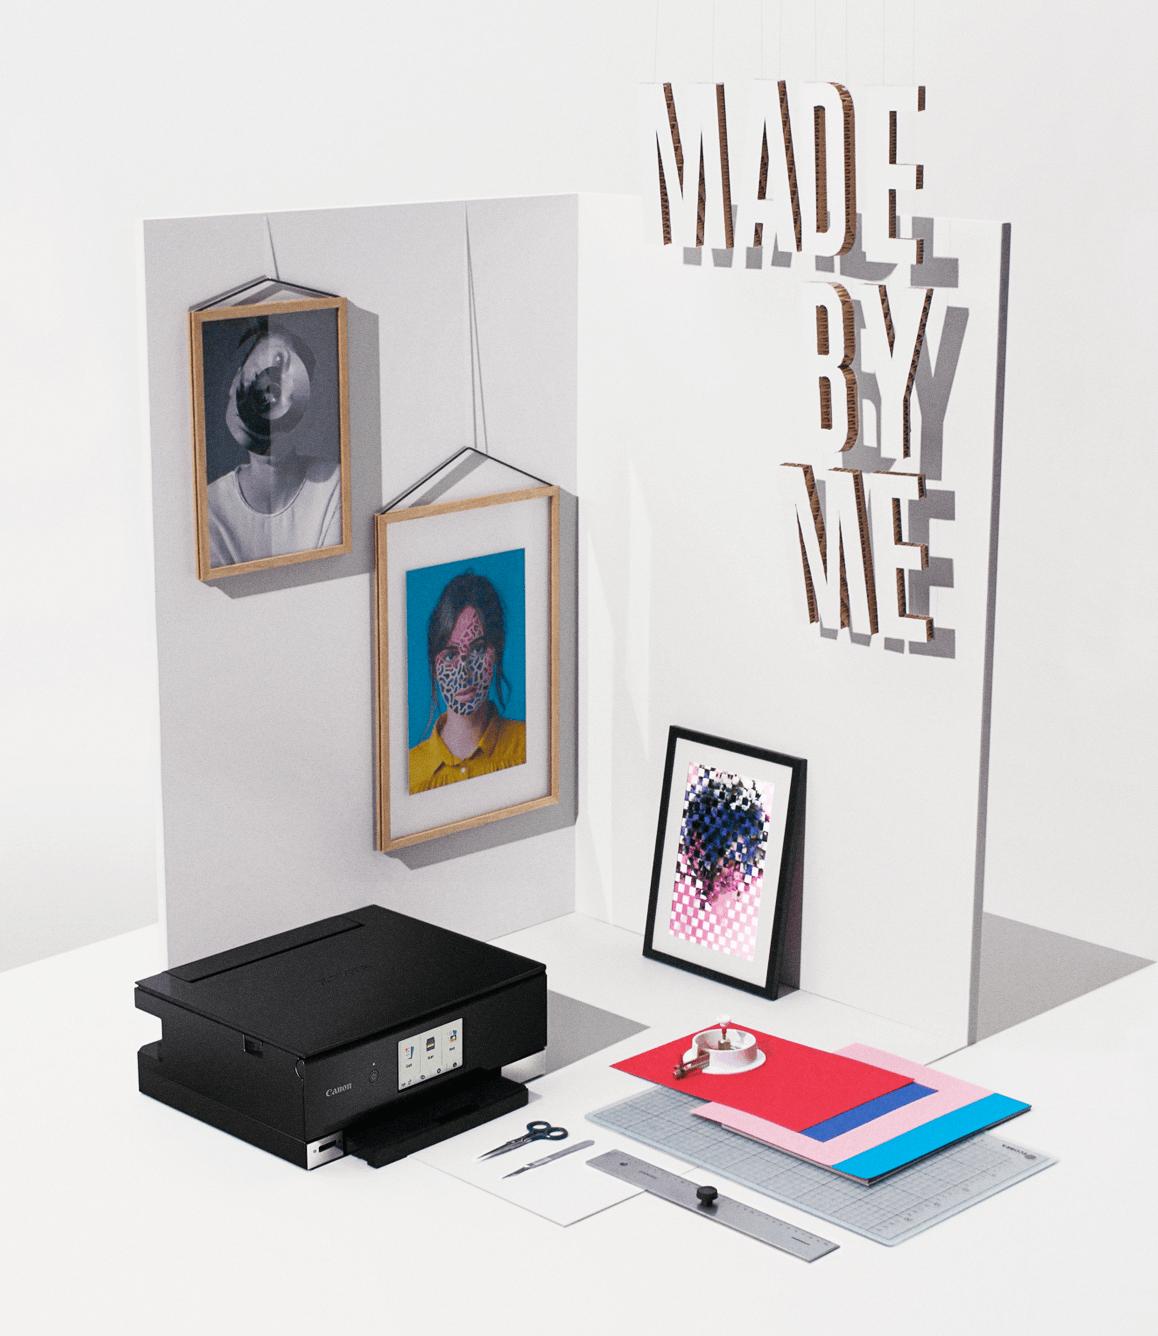 Creative Printing